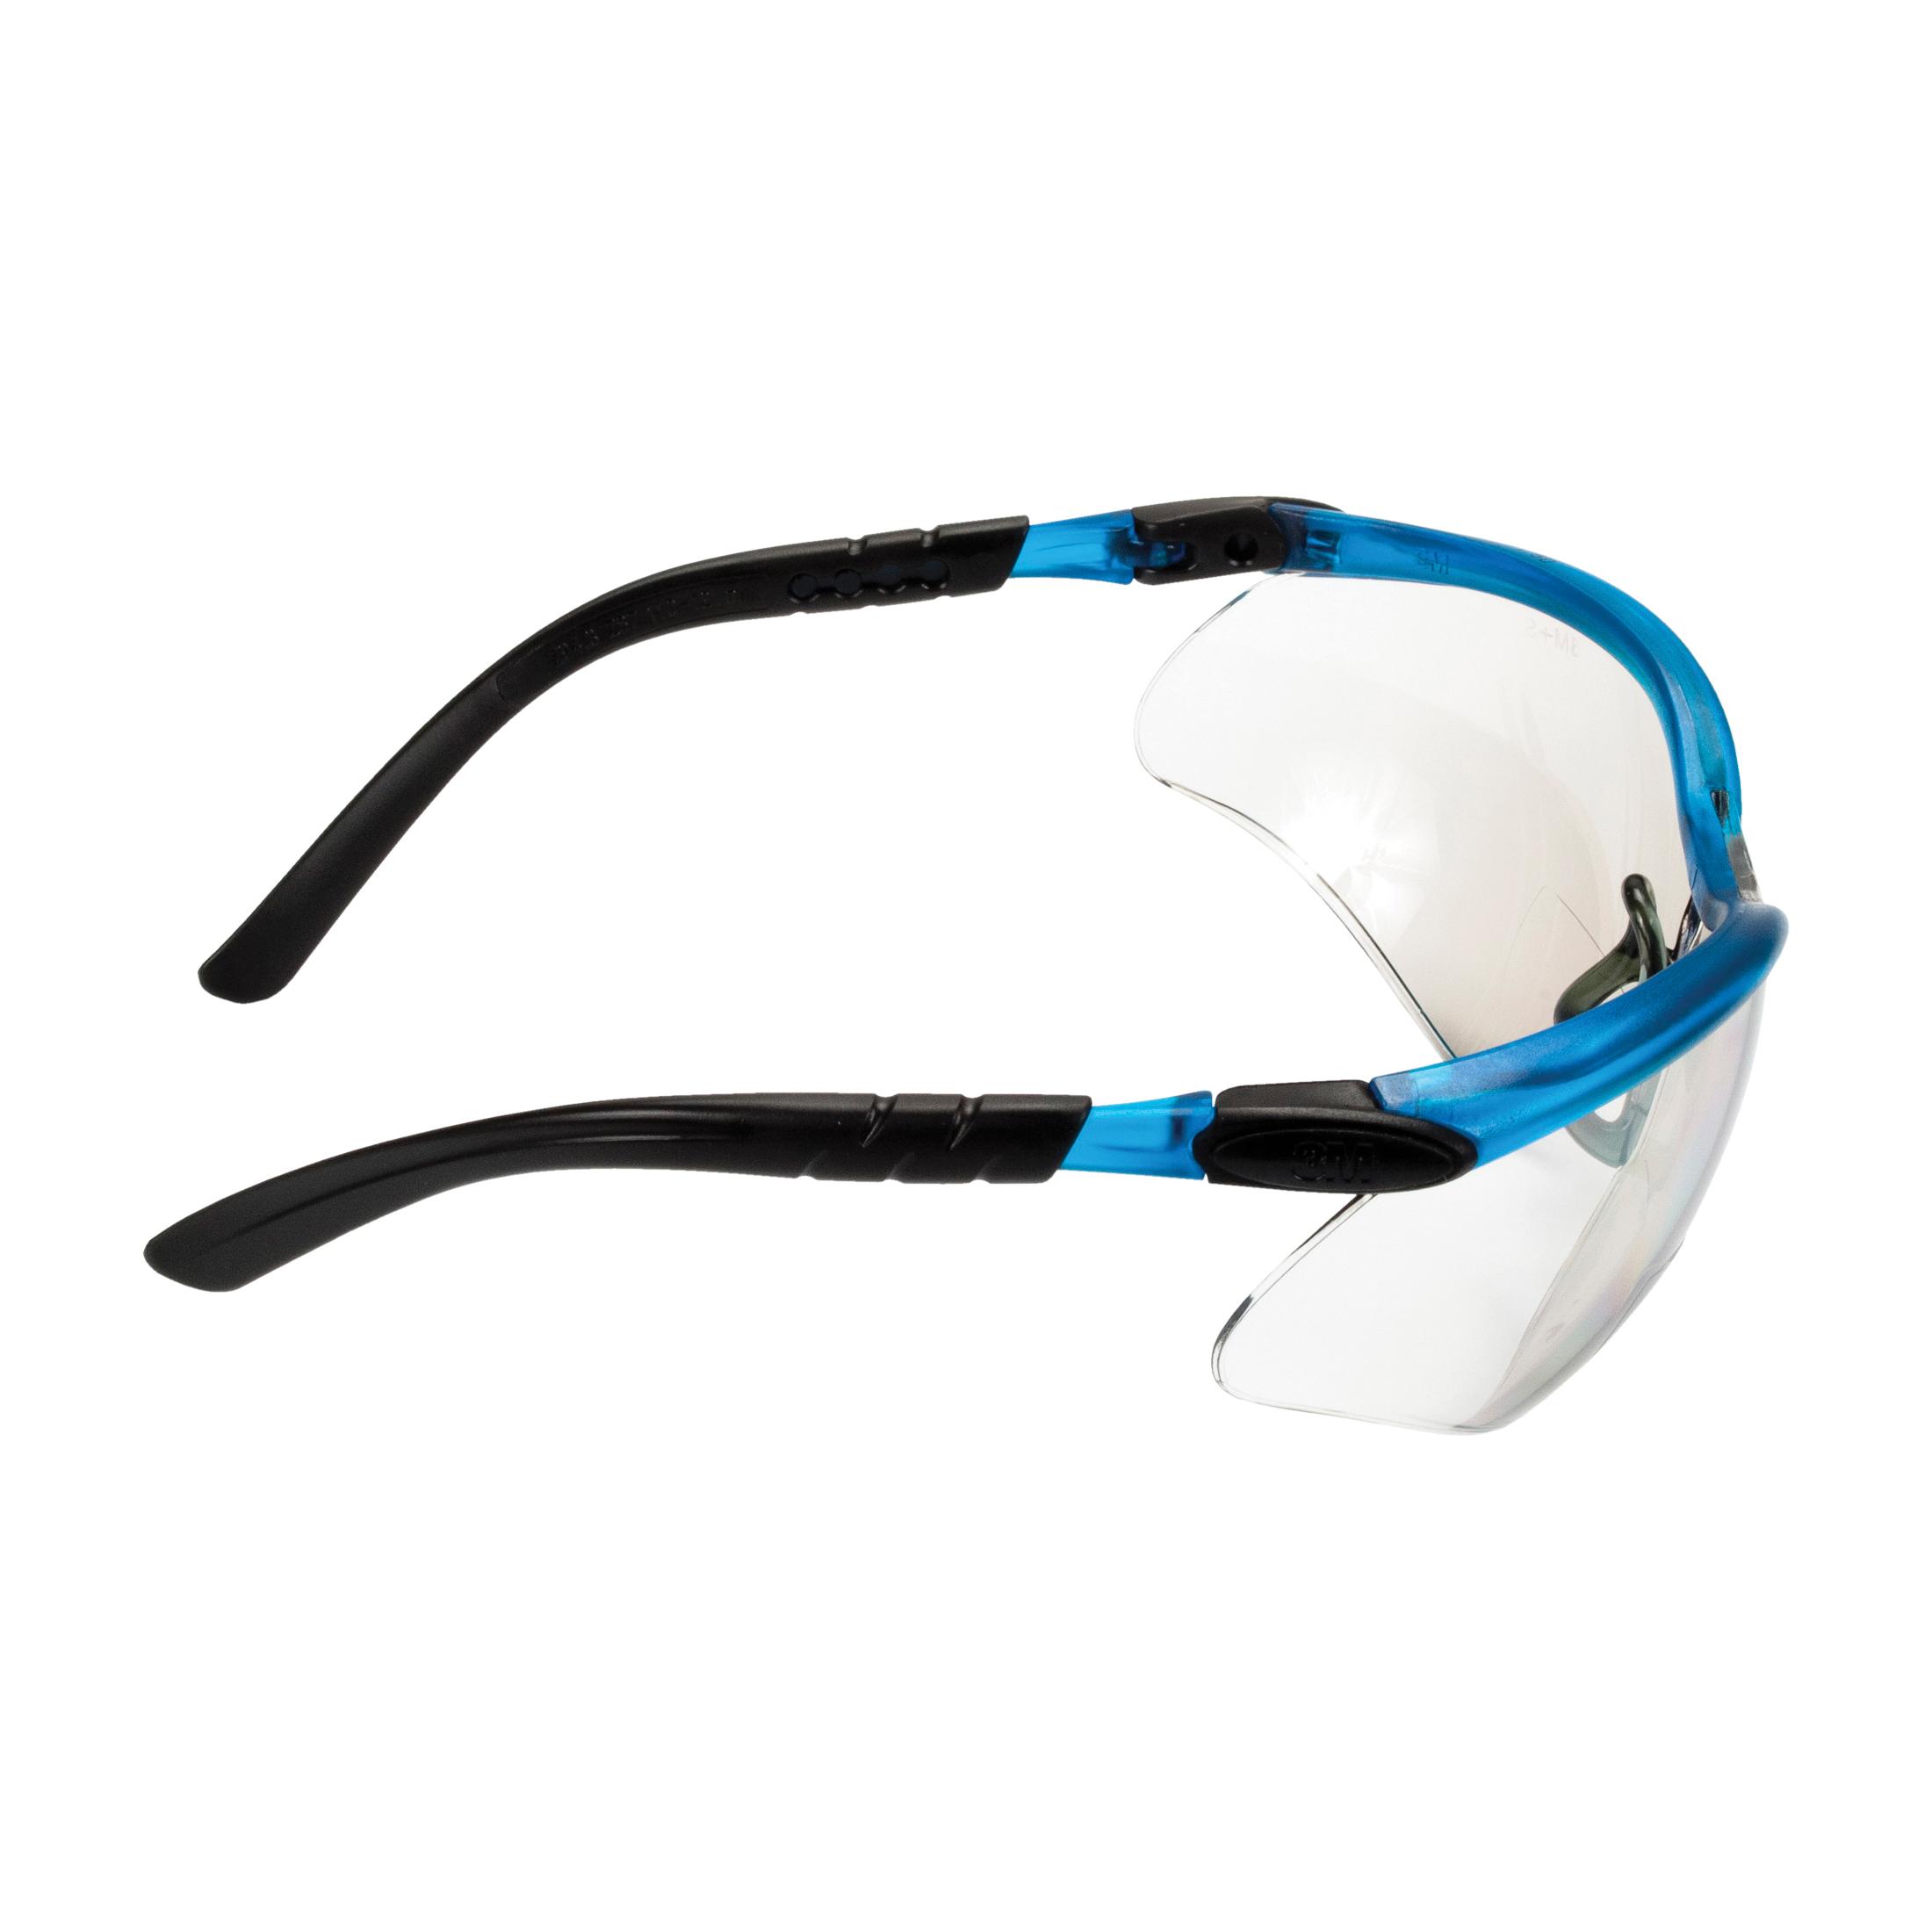 3M™ BX™ 078371-62046 Bi-Focal Lens Lightweight Reader Protective Eyewear, 1.5 Diopter, Clear Lens, Black/Silver, Plastic Frame, Polycarbonate Lens, 99.9 % UV Protection, ANSI Z87.1-2015, CSA Z94.3-2007